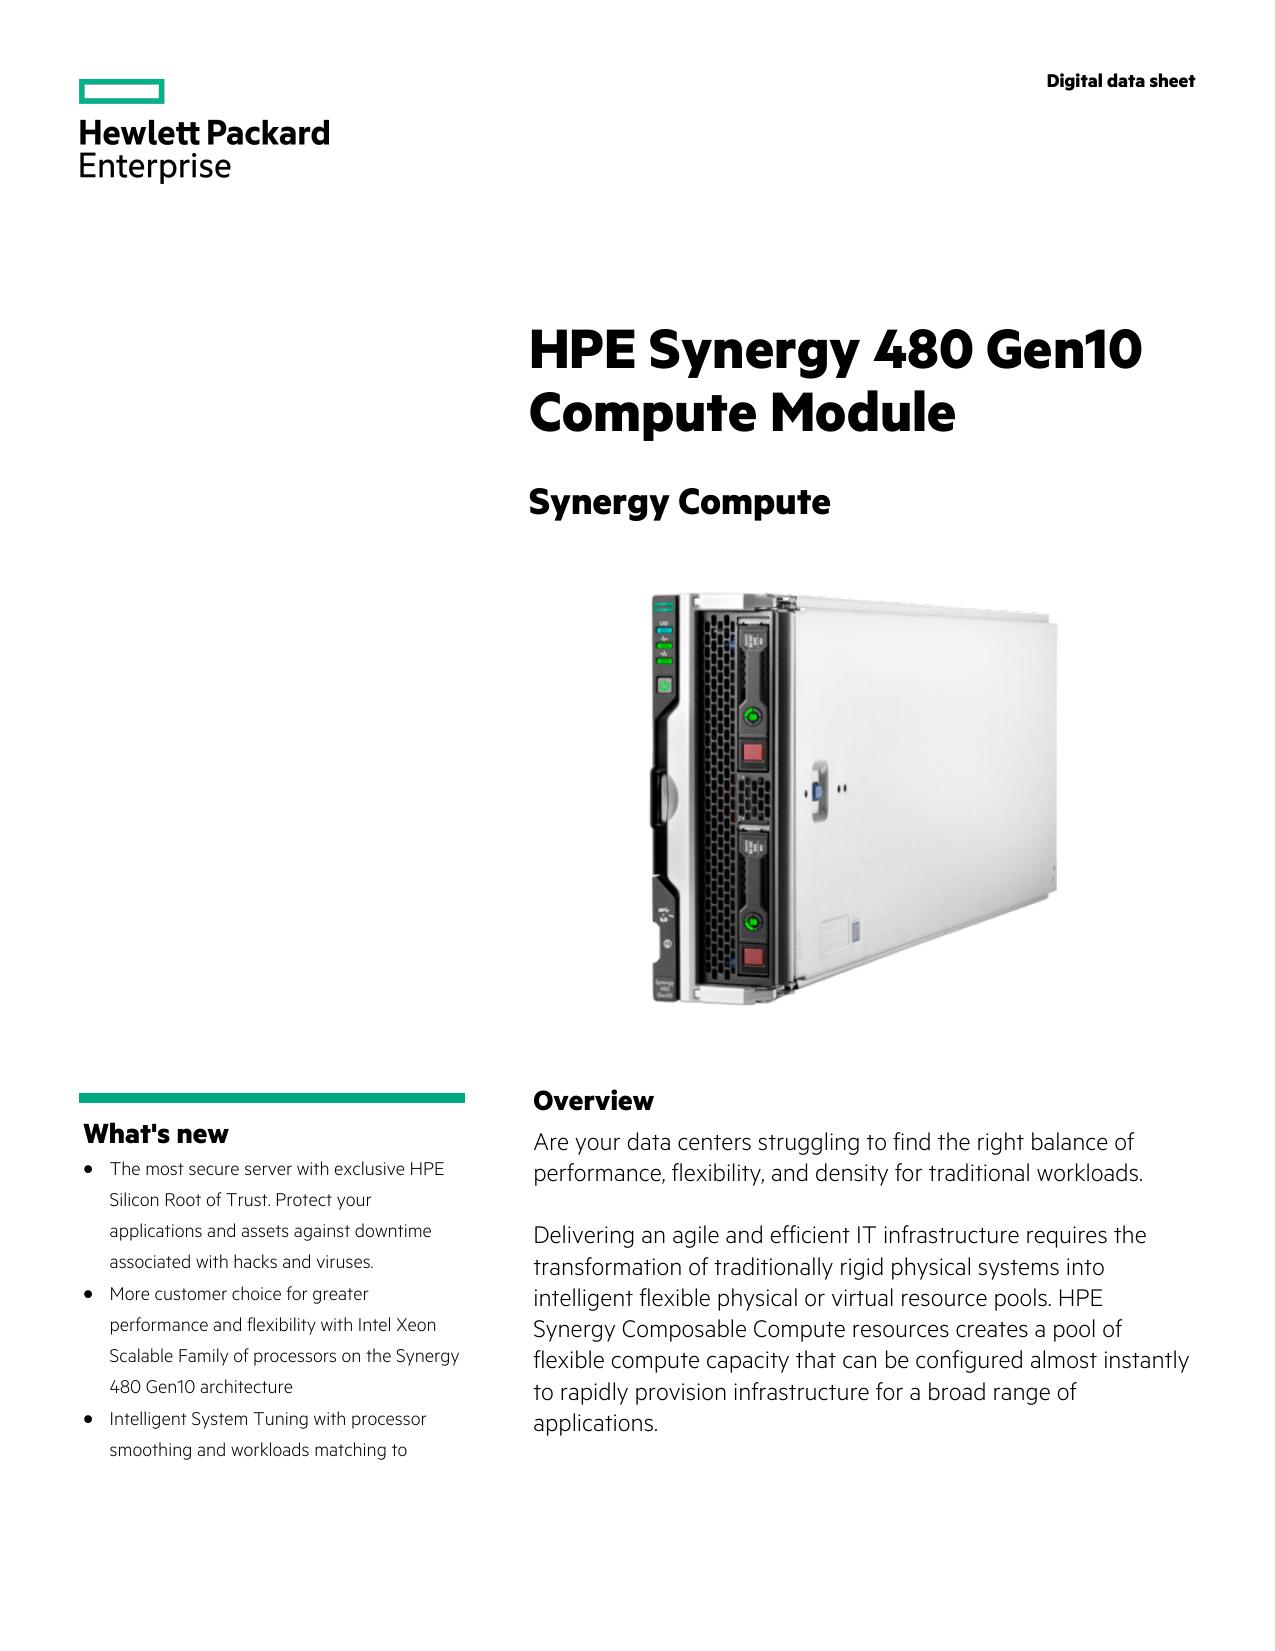 HPE Synergy 480 Gen10 Compute Module Digital   manualzz com